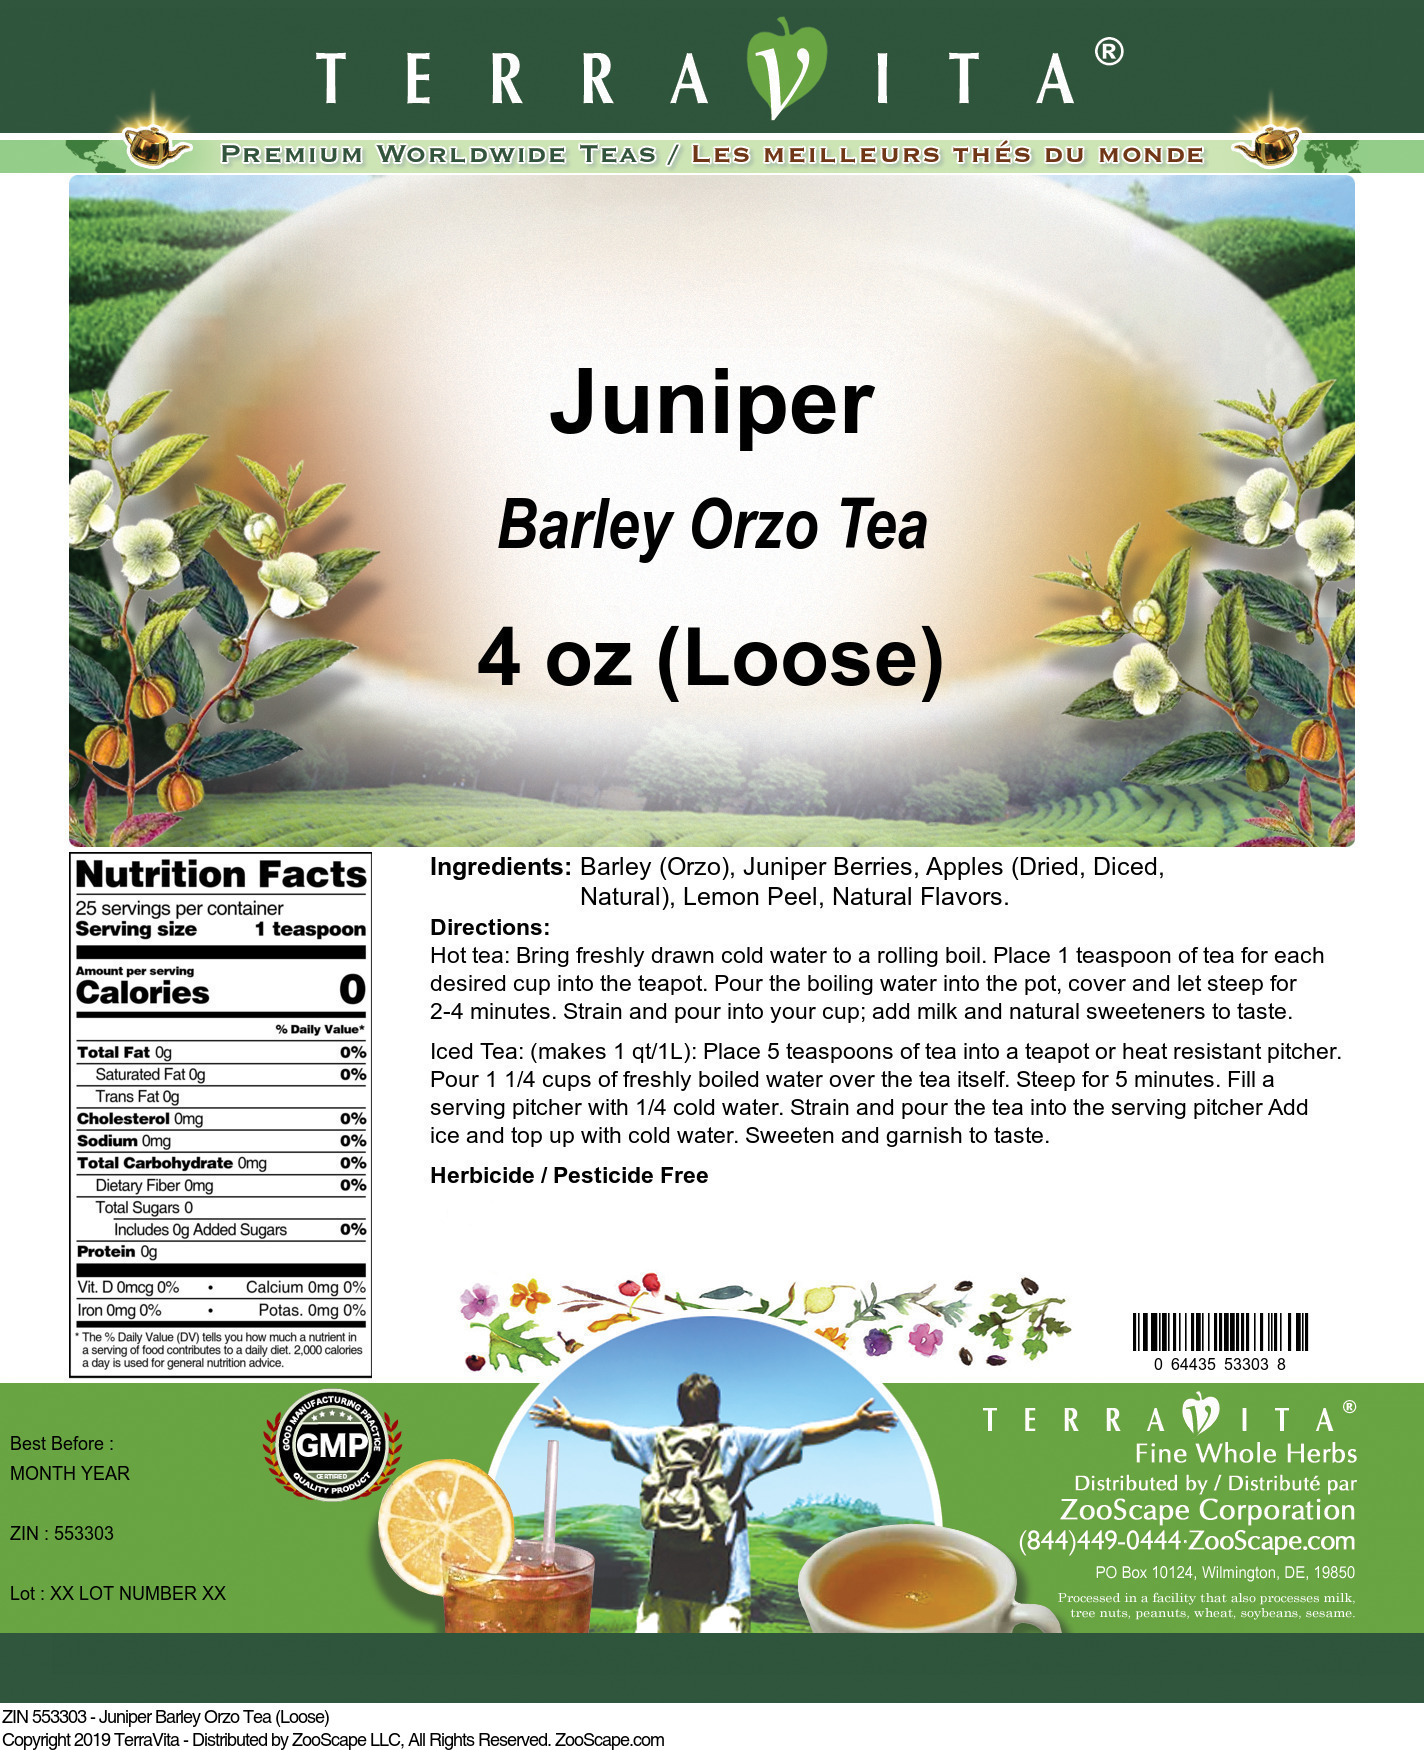 Juniper Barley Orzo Tea (Loose)